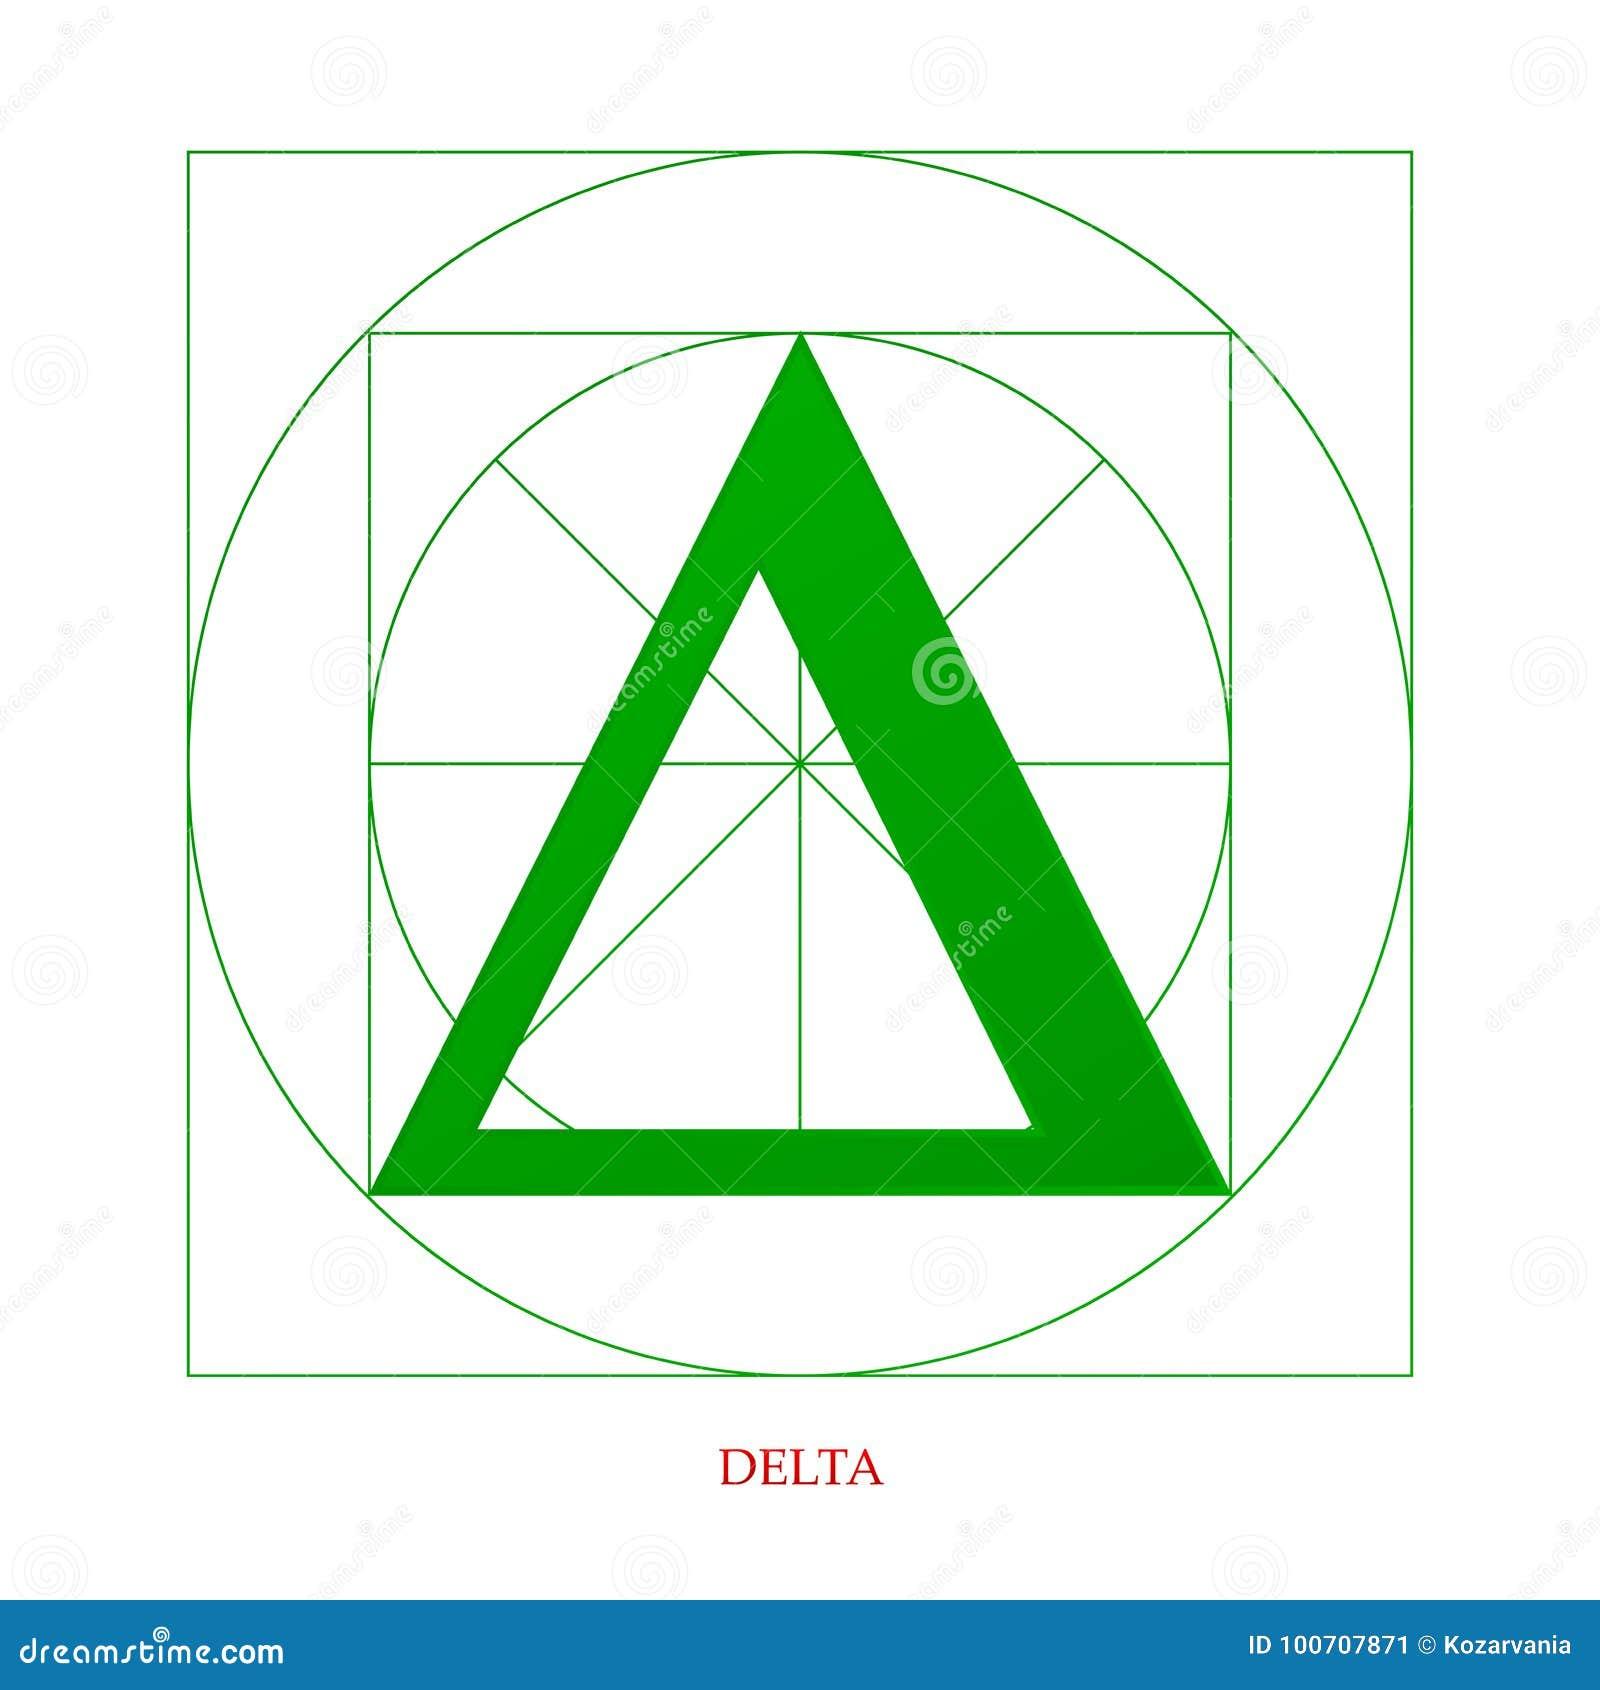 Delta Character Symbol Stock Vector Illustration Of Medical 100707871